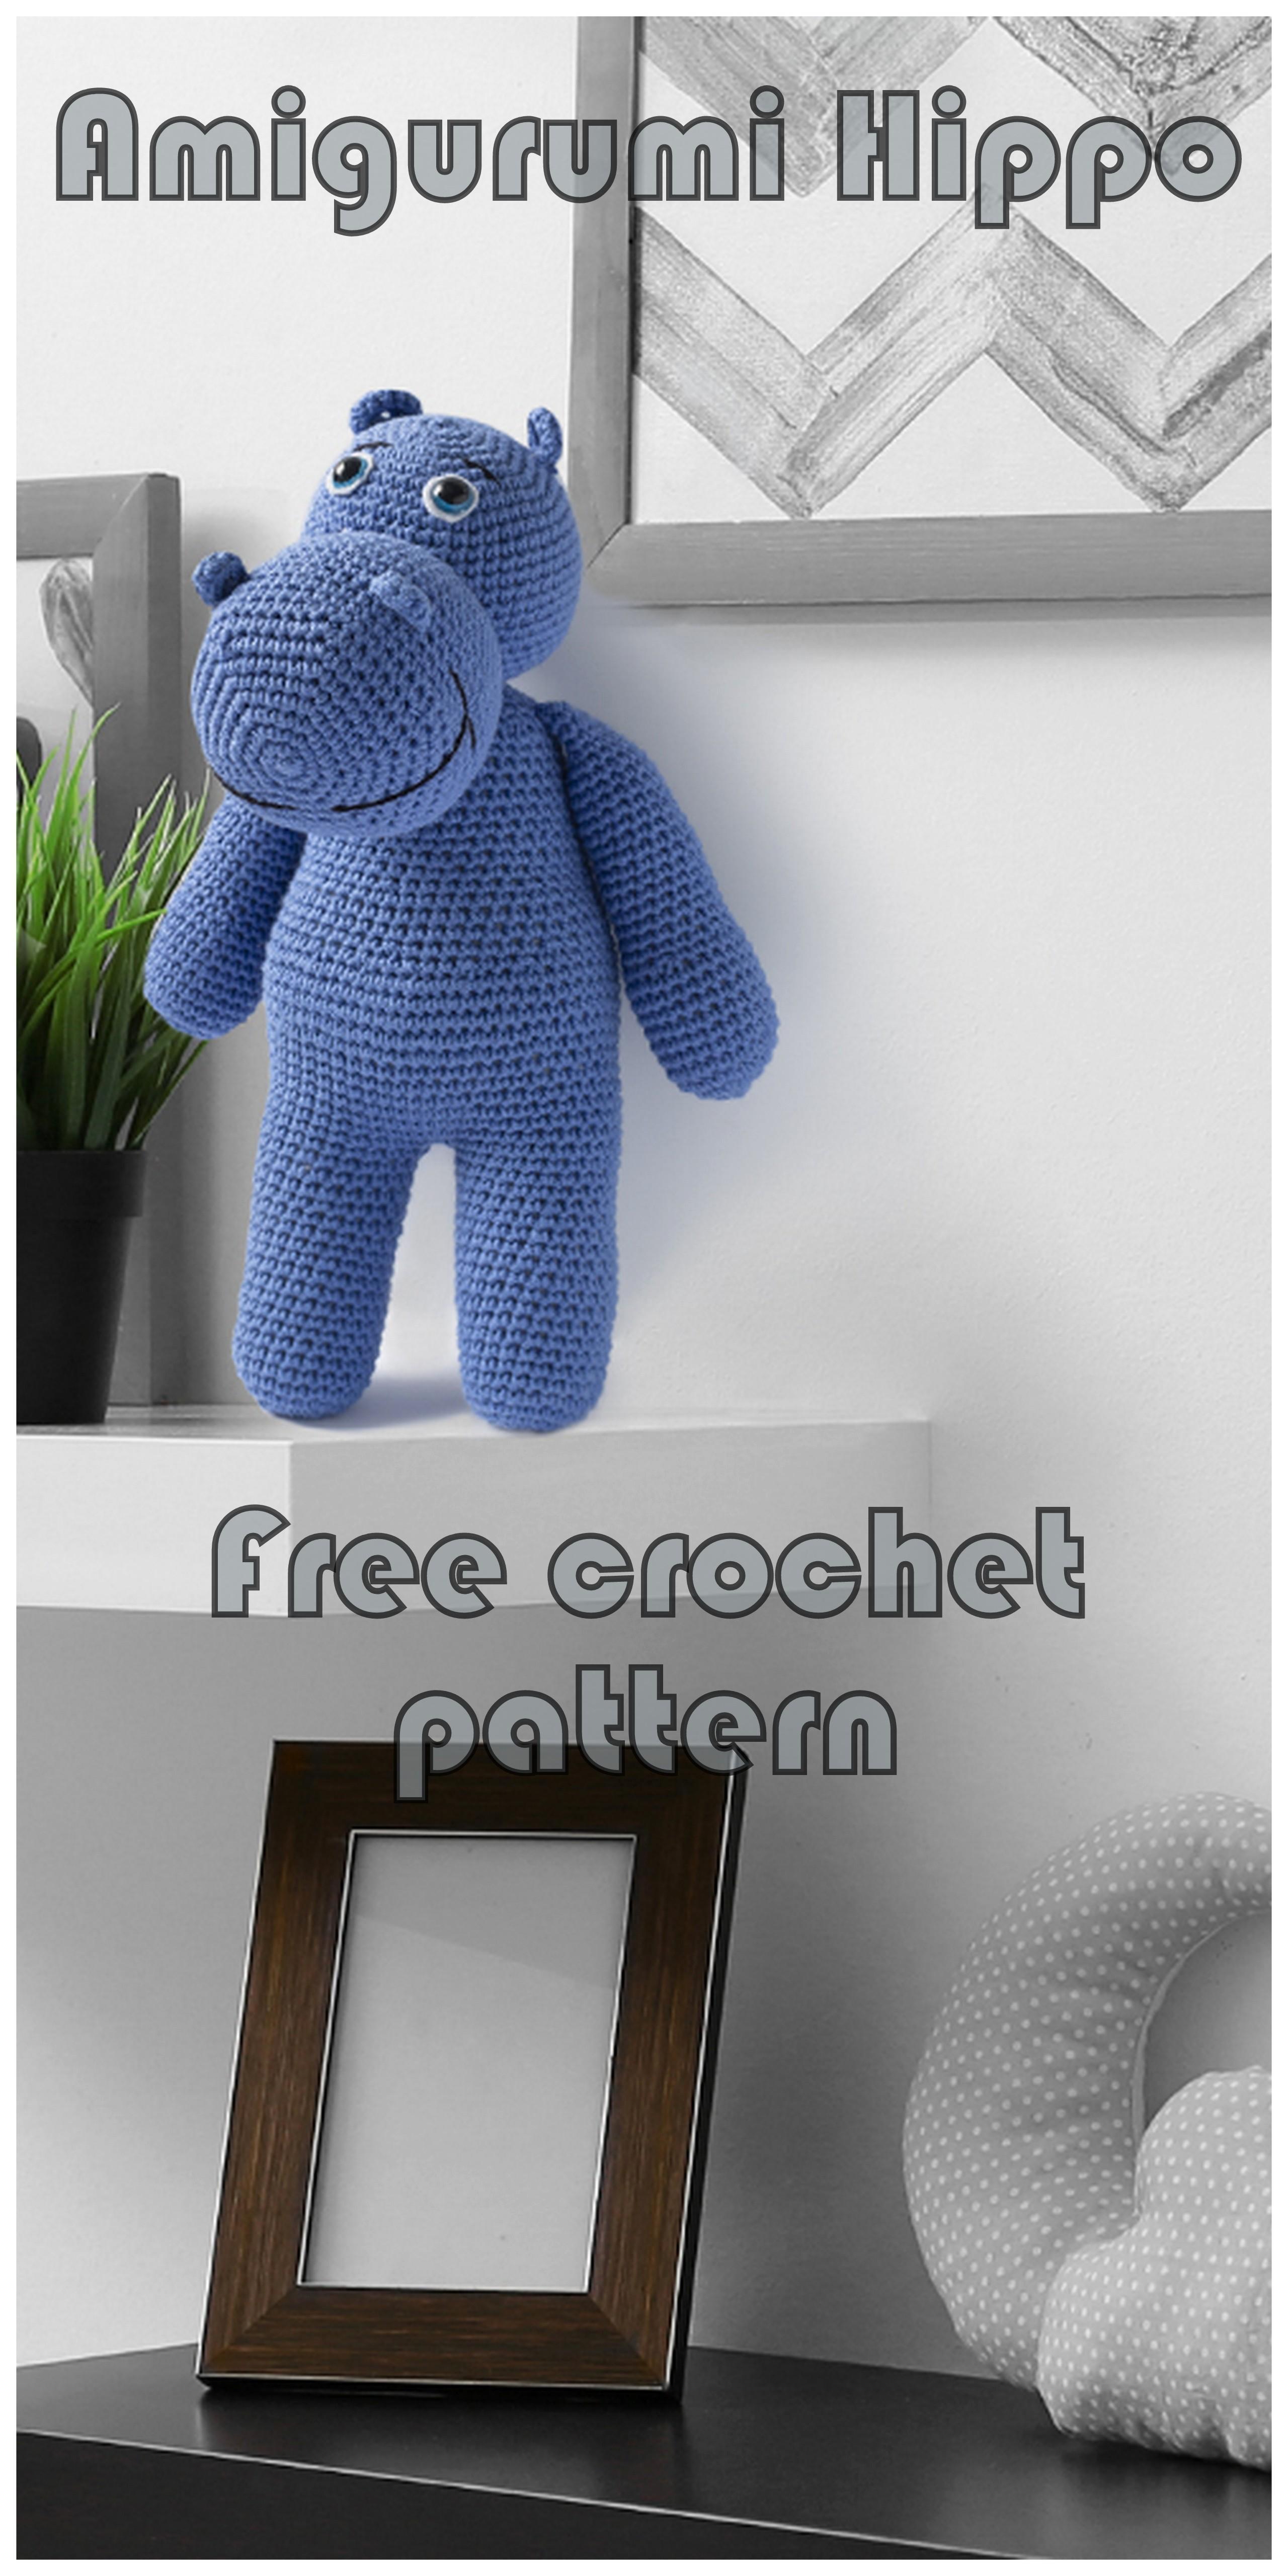 How to crochet an Hippo | World Of Amigurumi - YouTube | 5120x2560